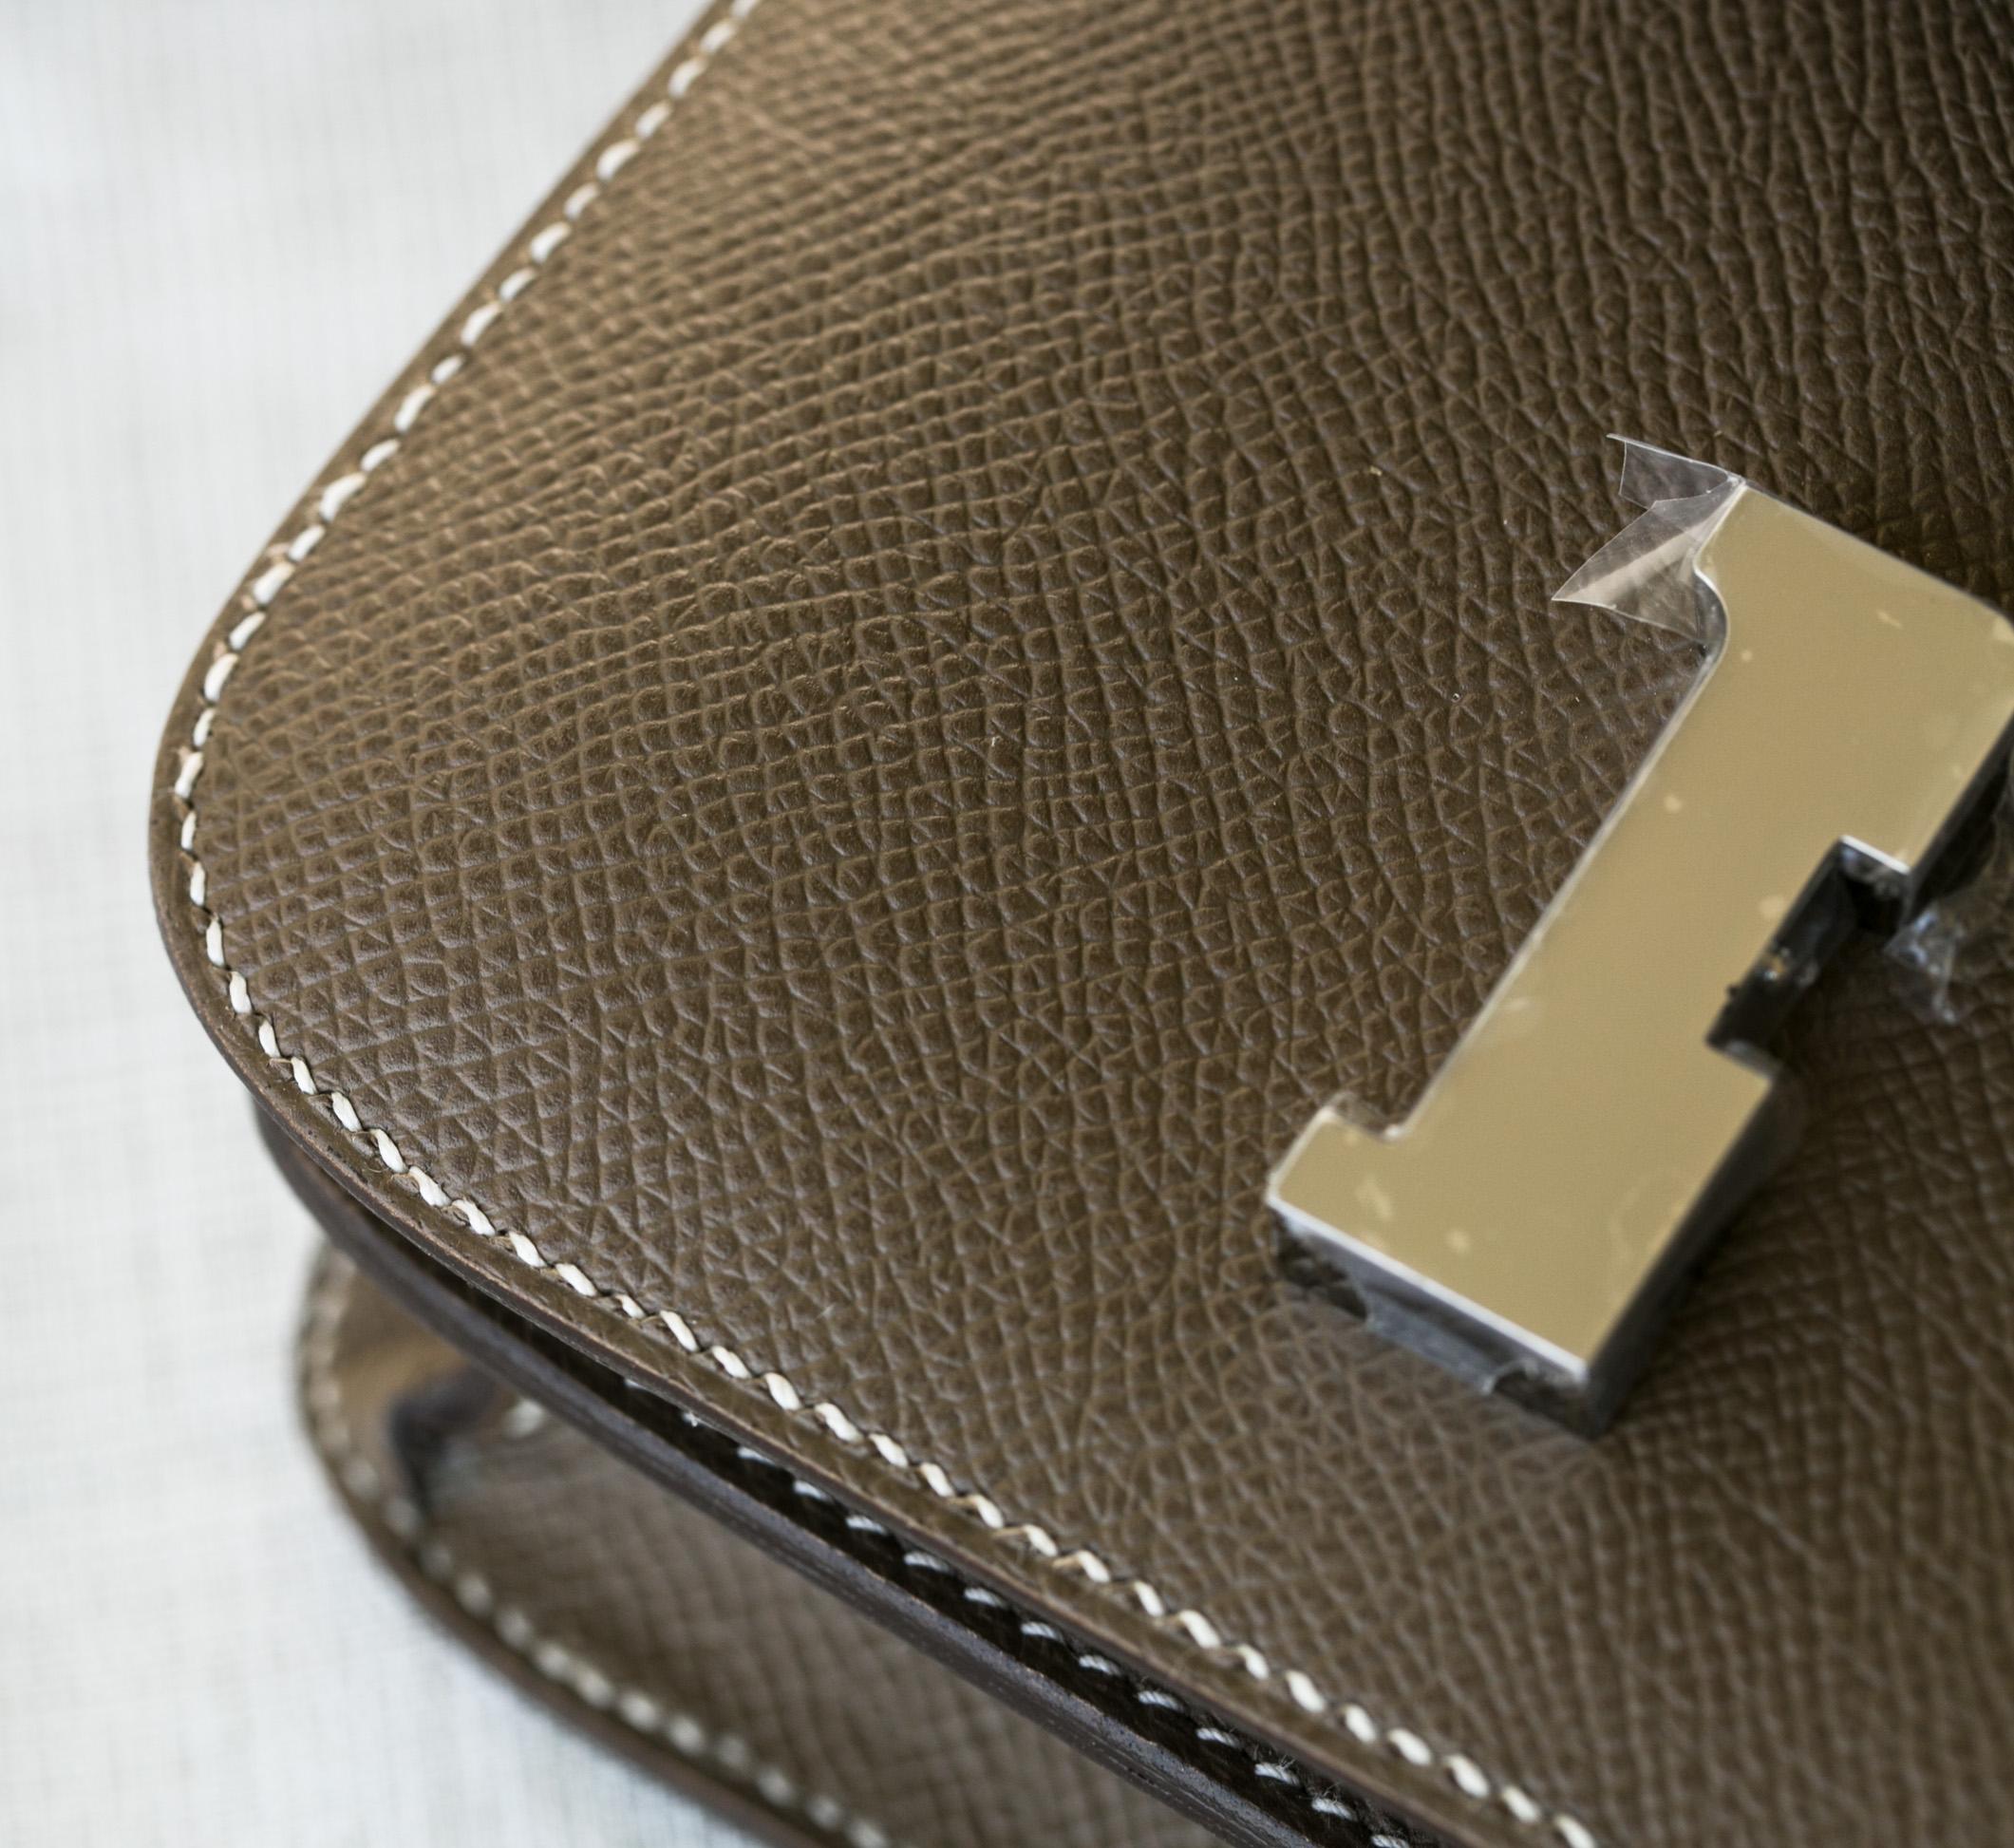 爱马仕空姐包价格 Hermes CK18大象灰epsom牛皮Constance24cm 银扣